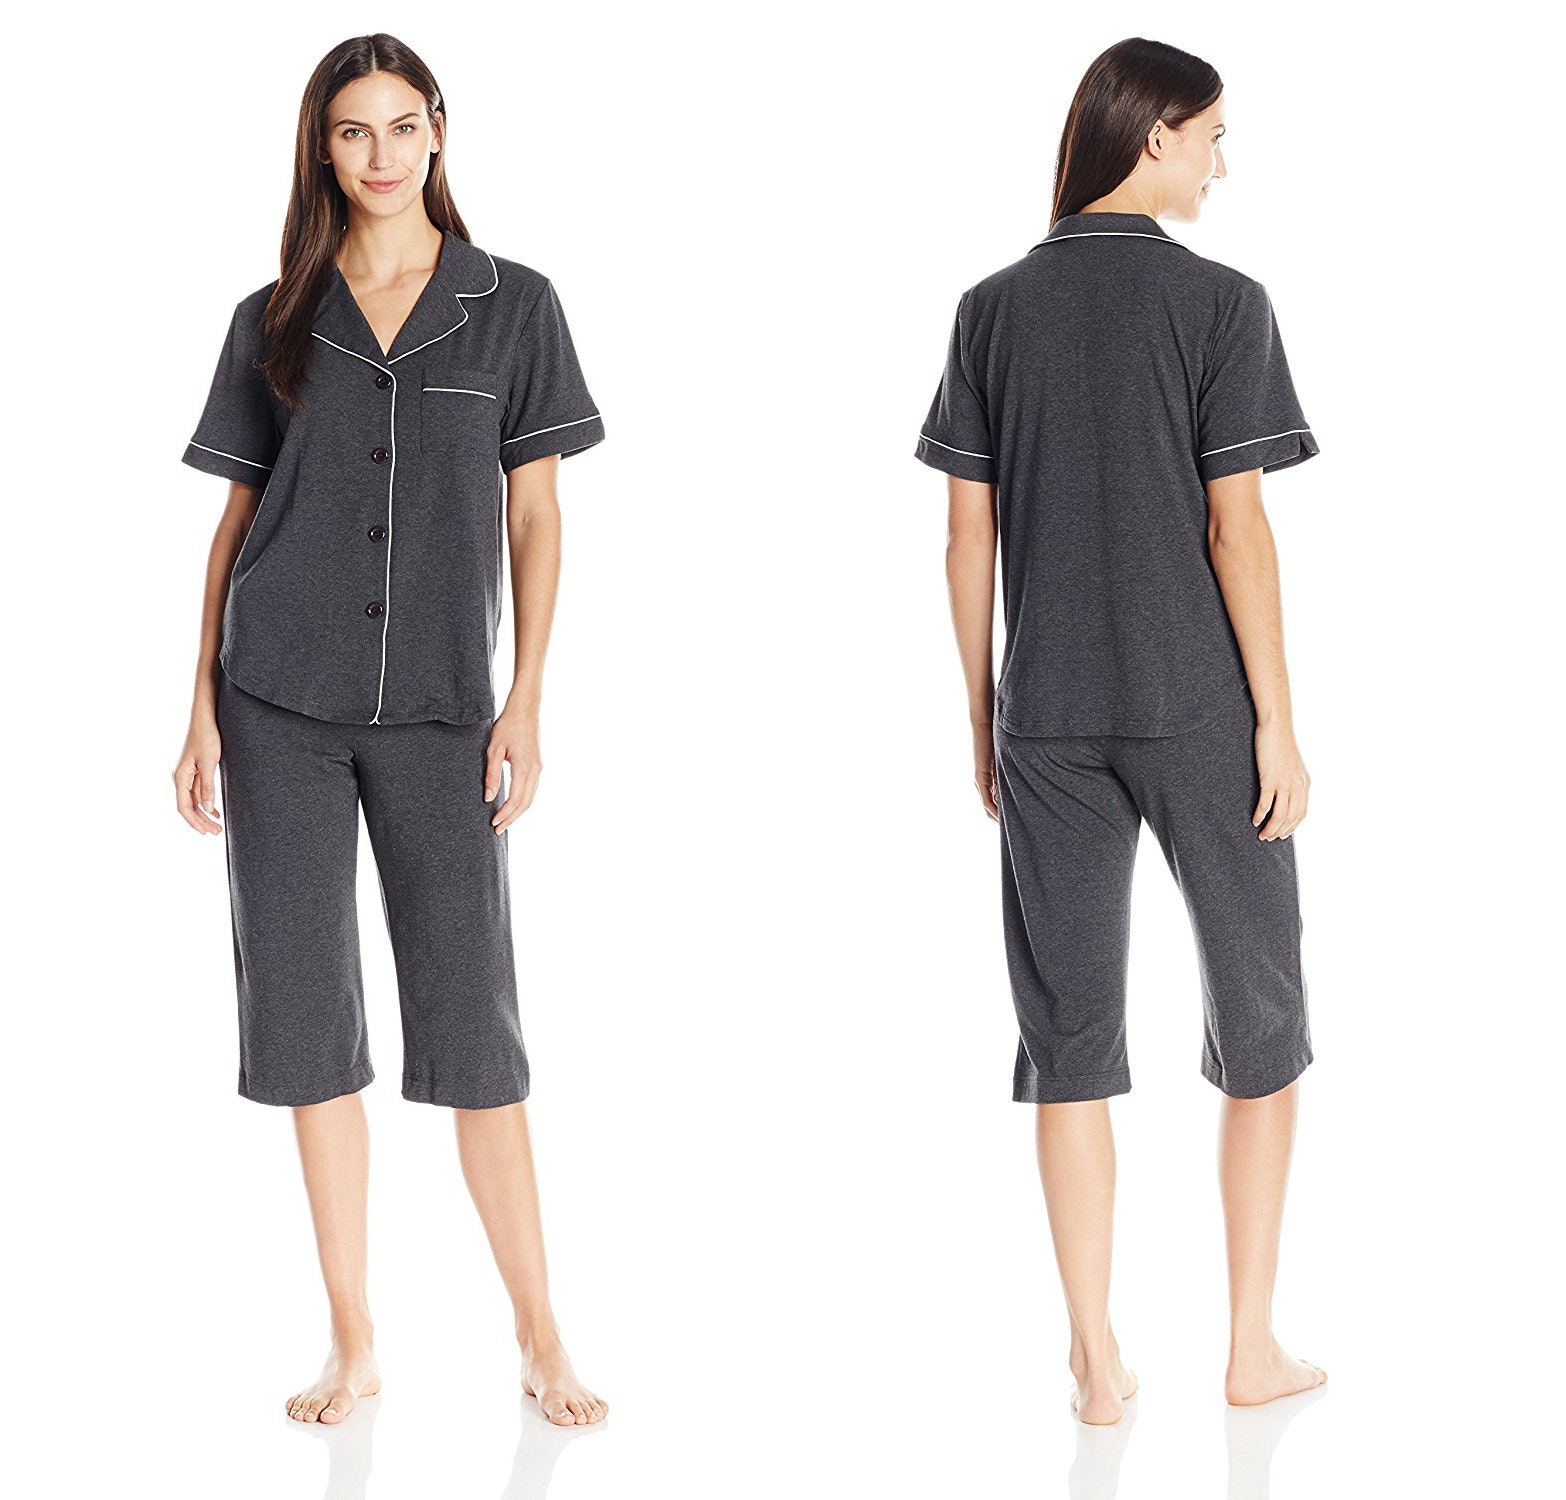 products fashionmia pajamas lotus printed mid pajama rise comfortable set com cotton comforter